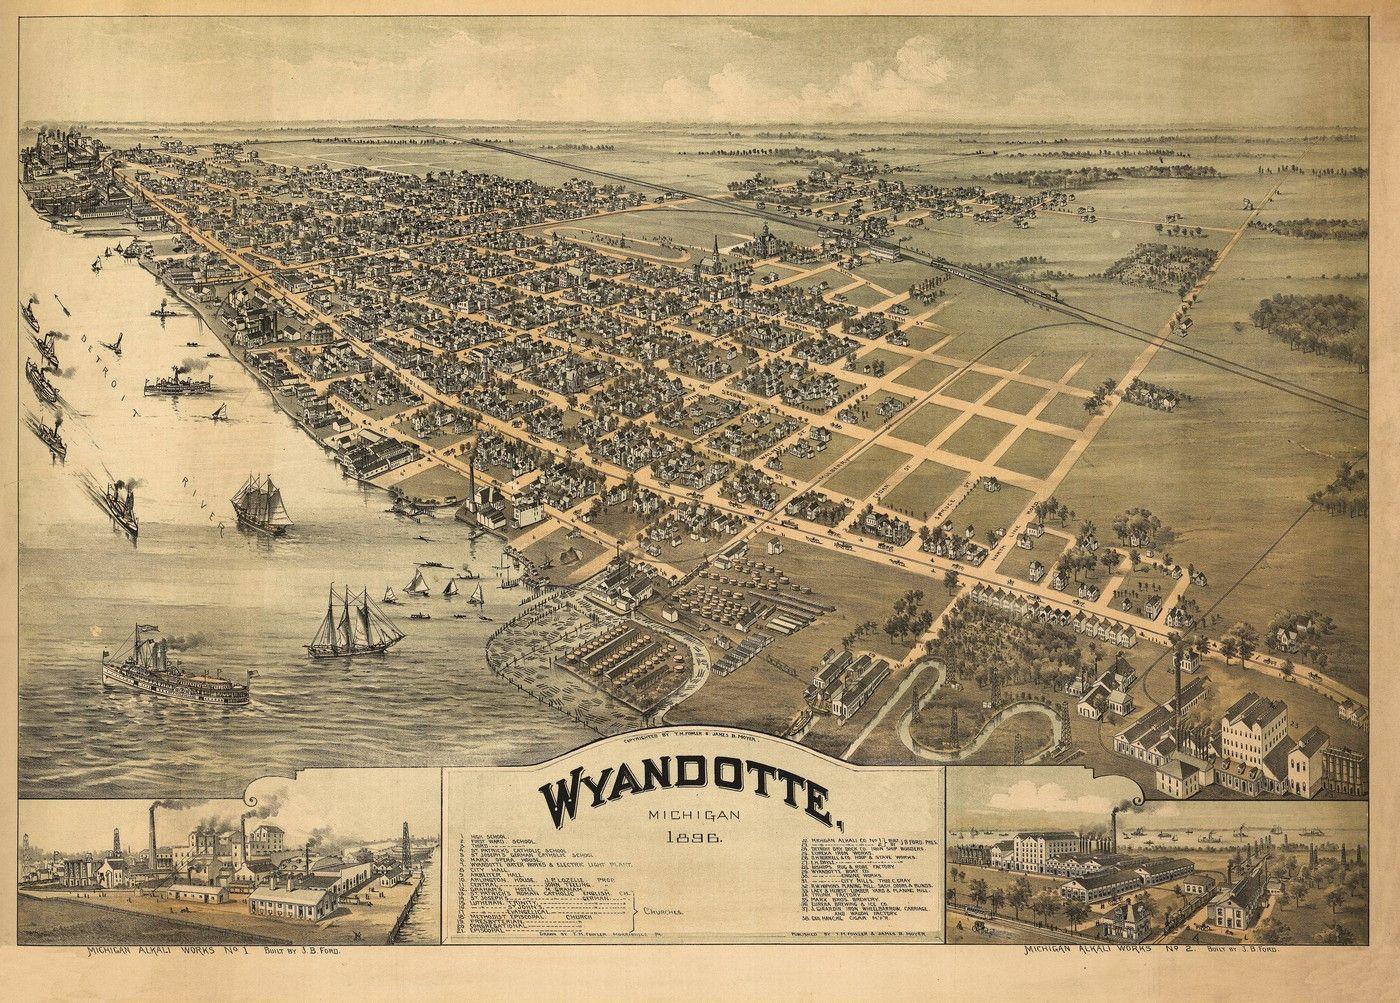 Historic map of wyandotte michigan 1896 wayne county